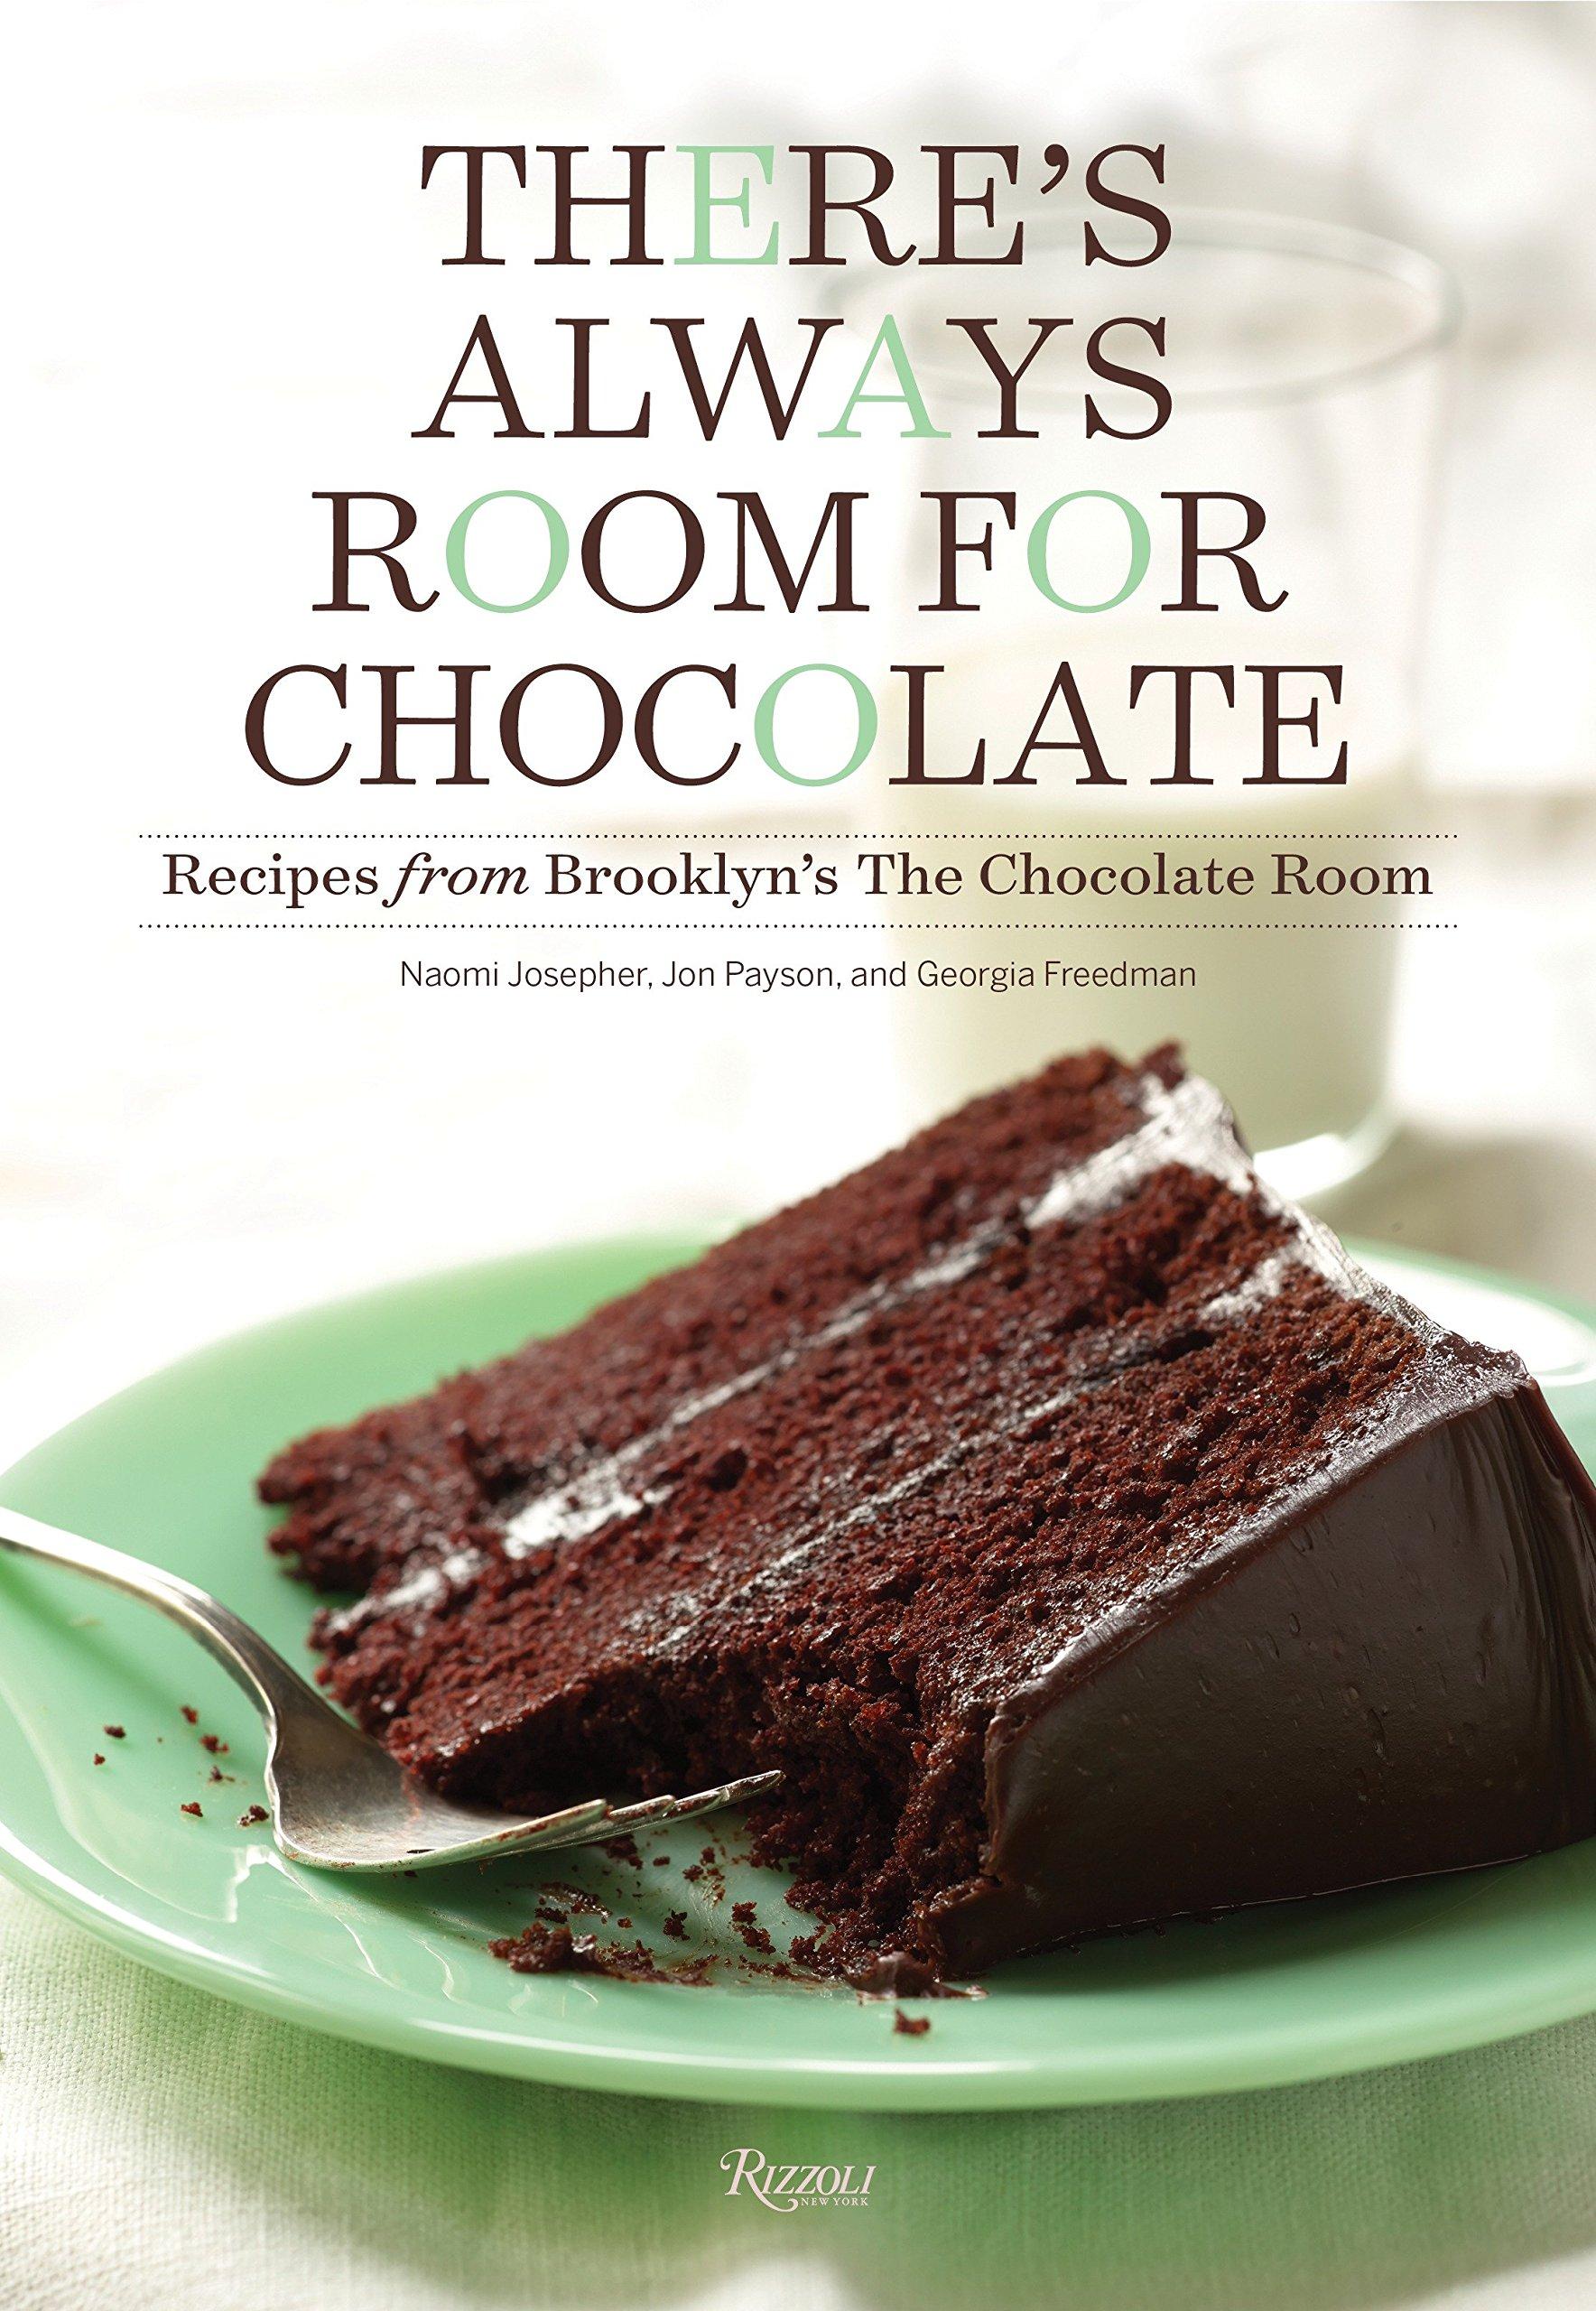 There S Always Room For Chocolate Recipes From Brooklyn The Josepher Naomi Payson Jon Freedman Georgia 9780847848638 Amazon Com Books